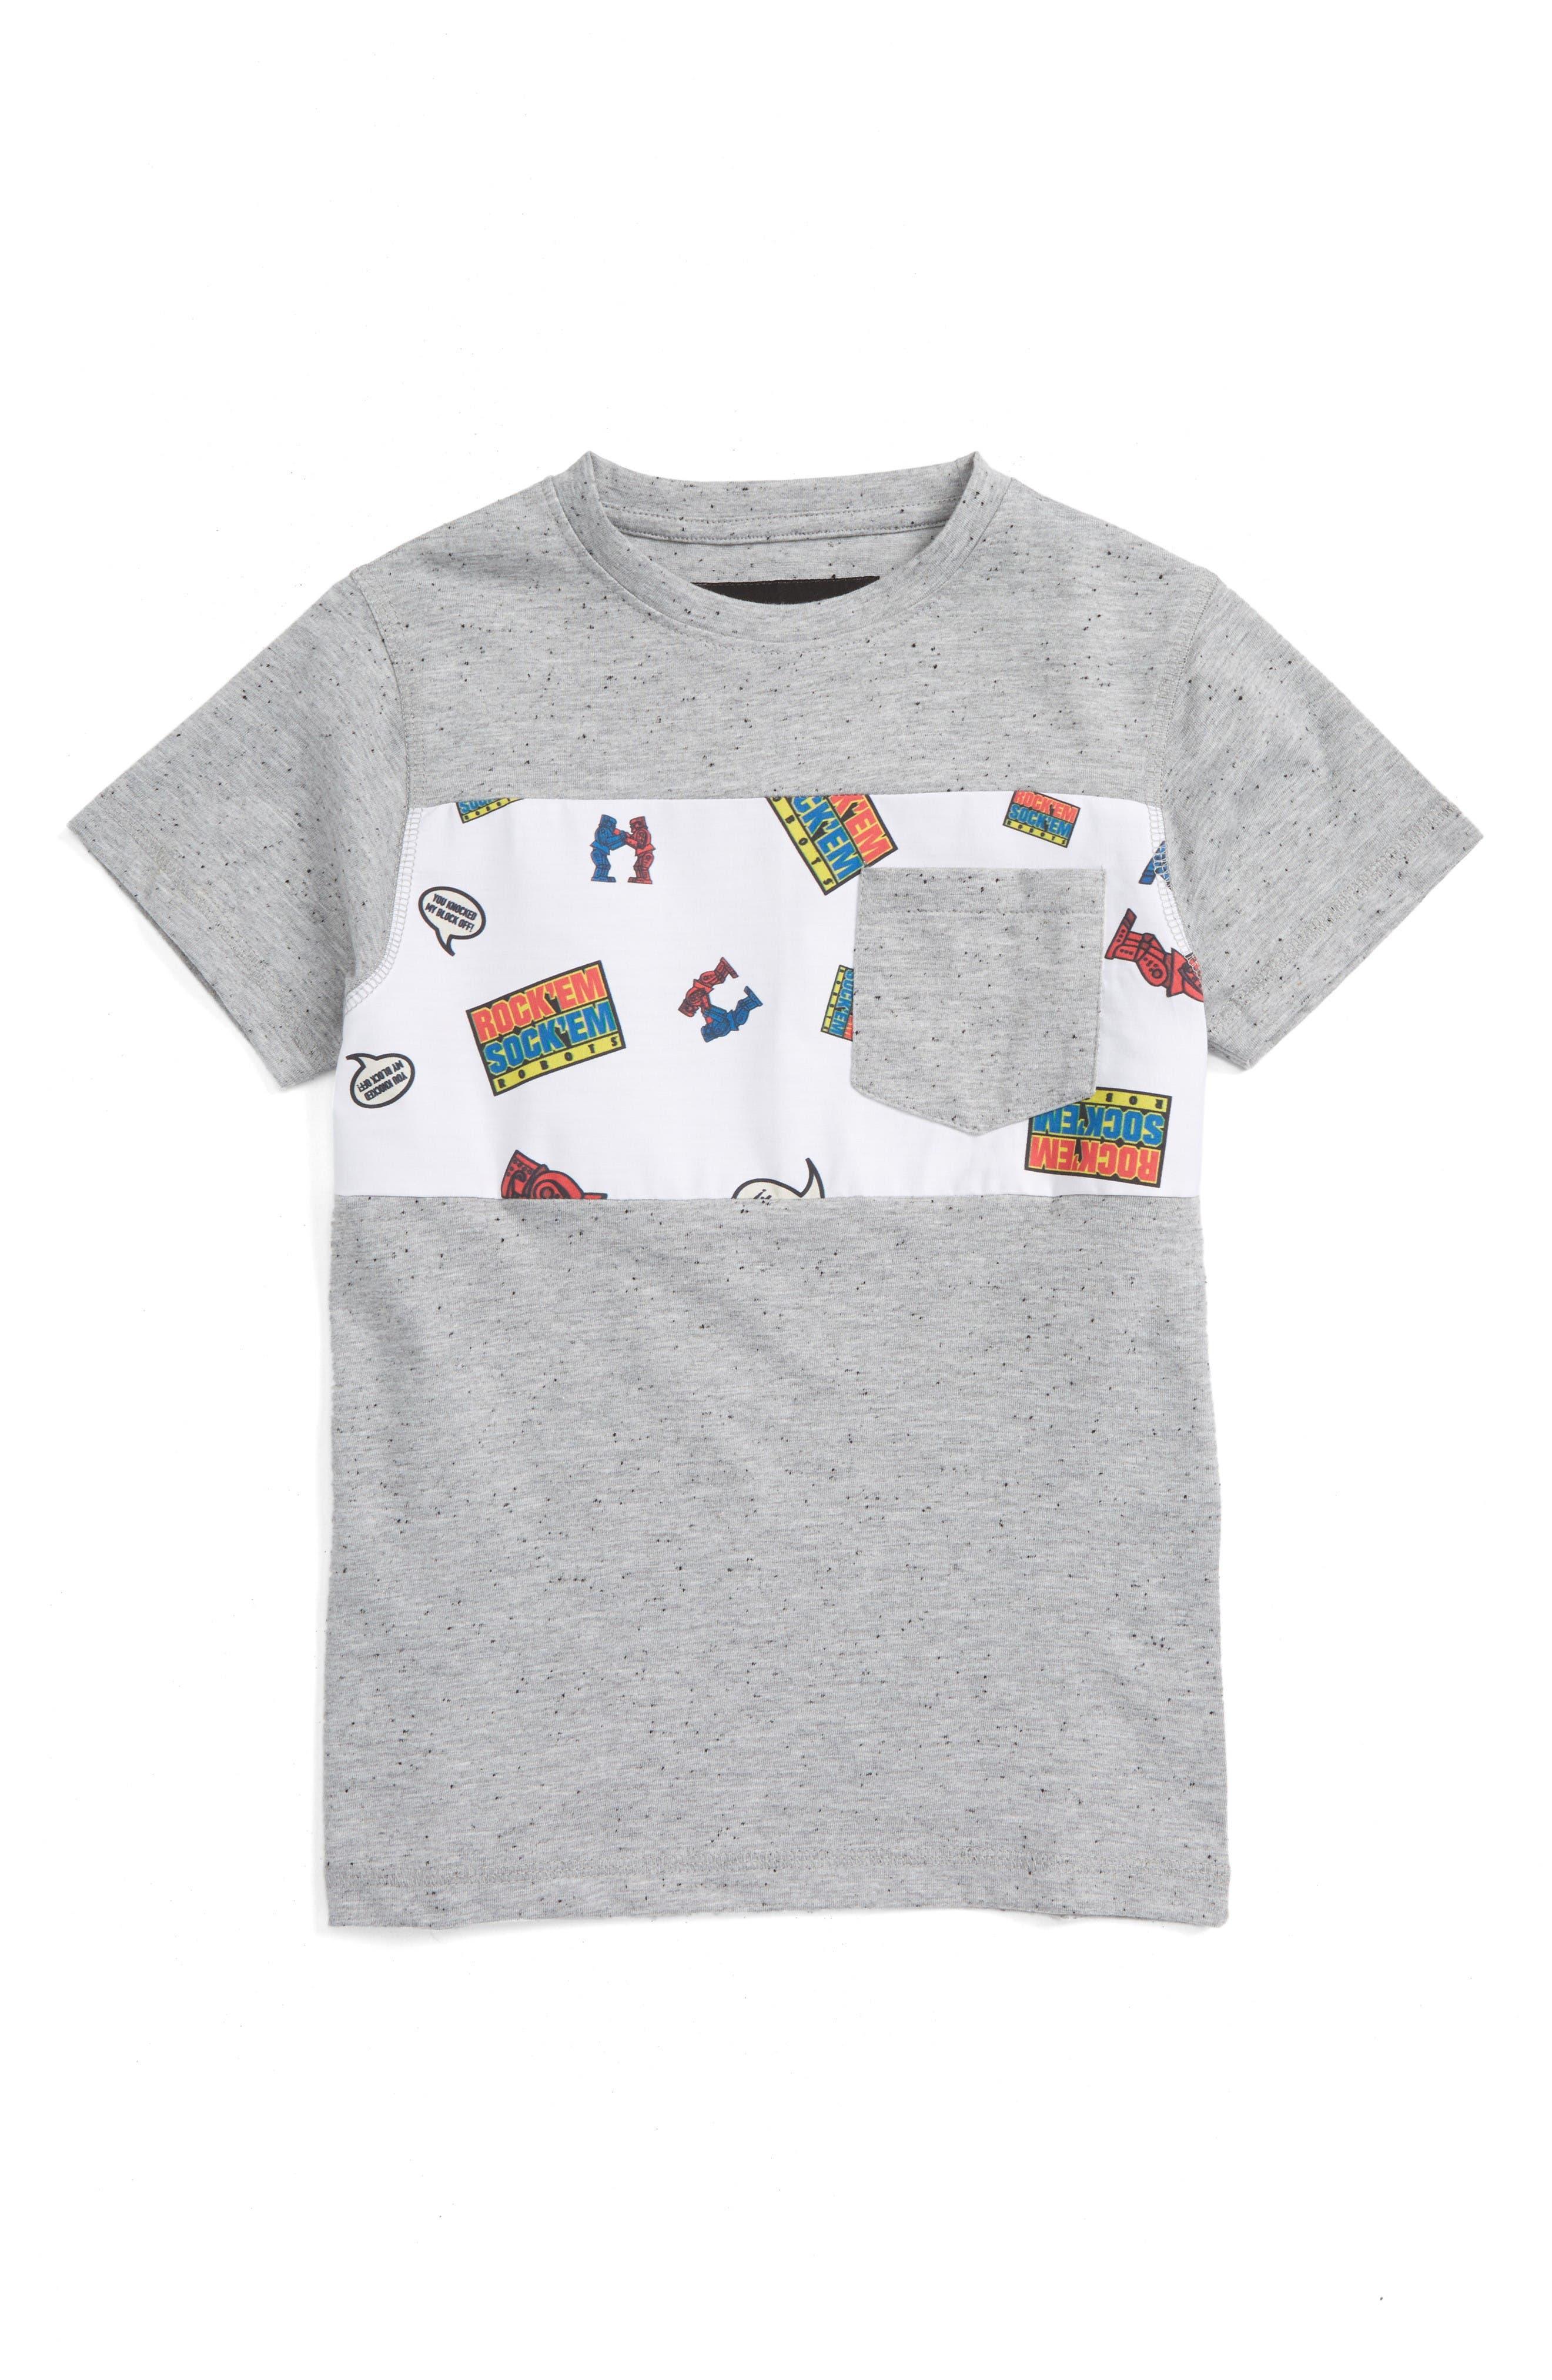 Mattel x Artistry in Motion Rock'em Graphic T-Shirt (Little Boys)